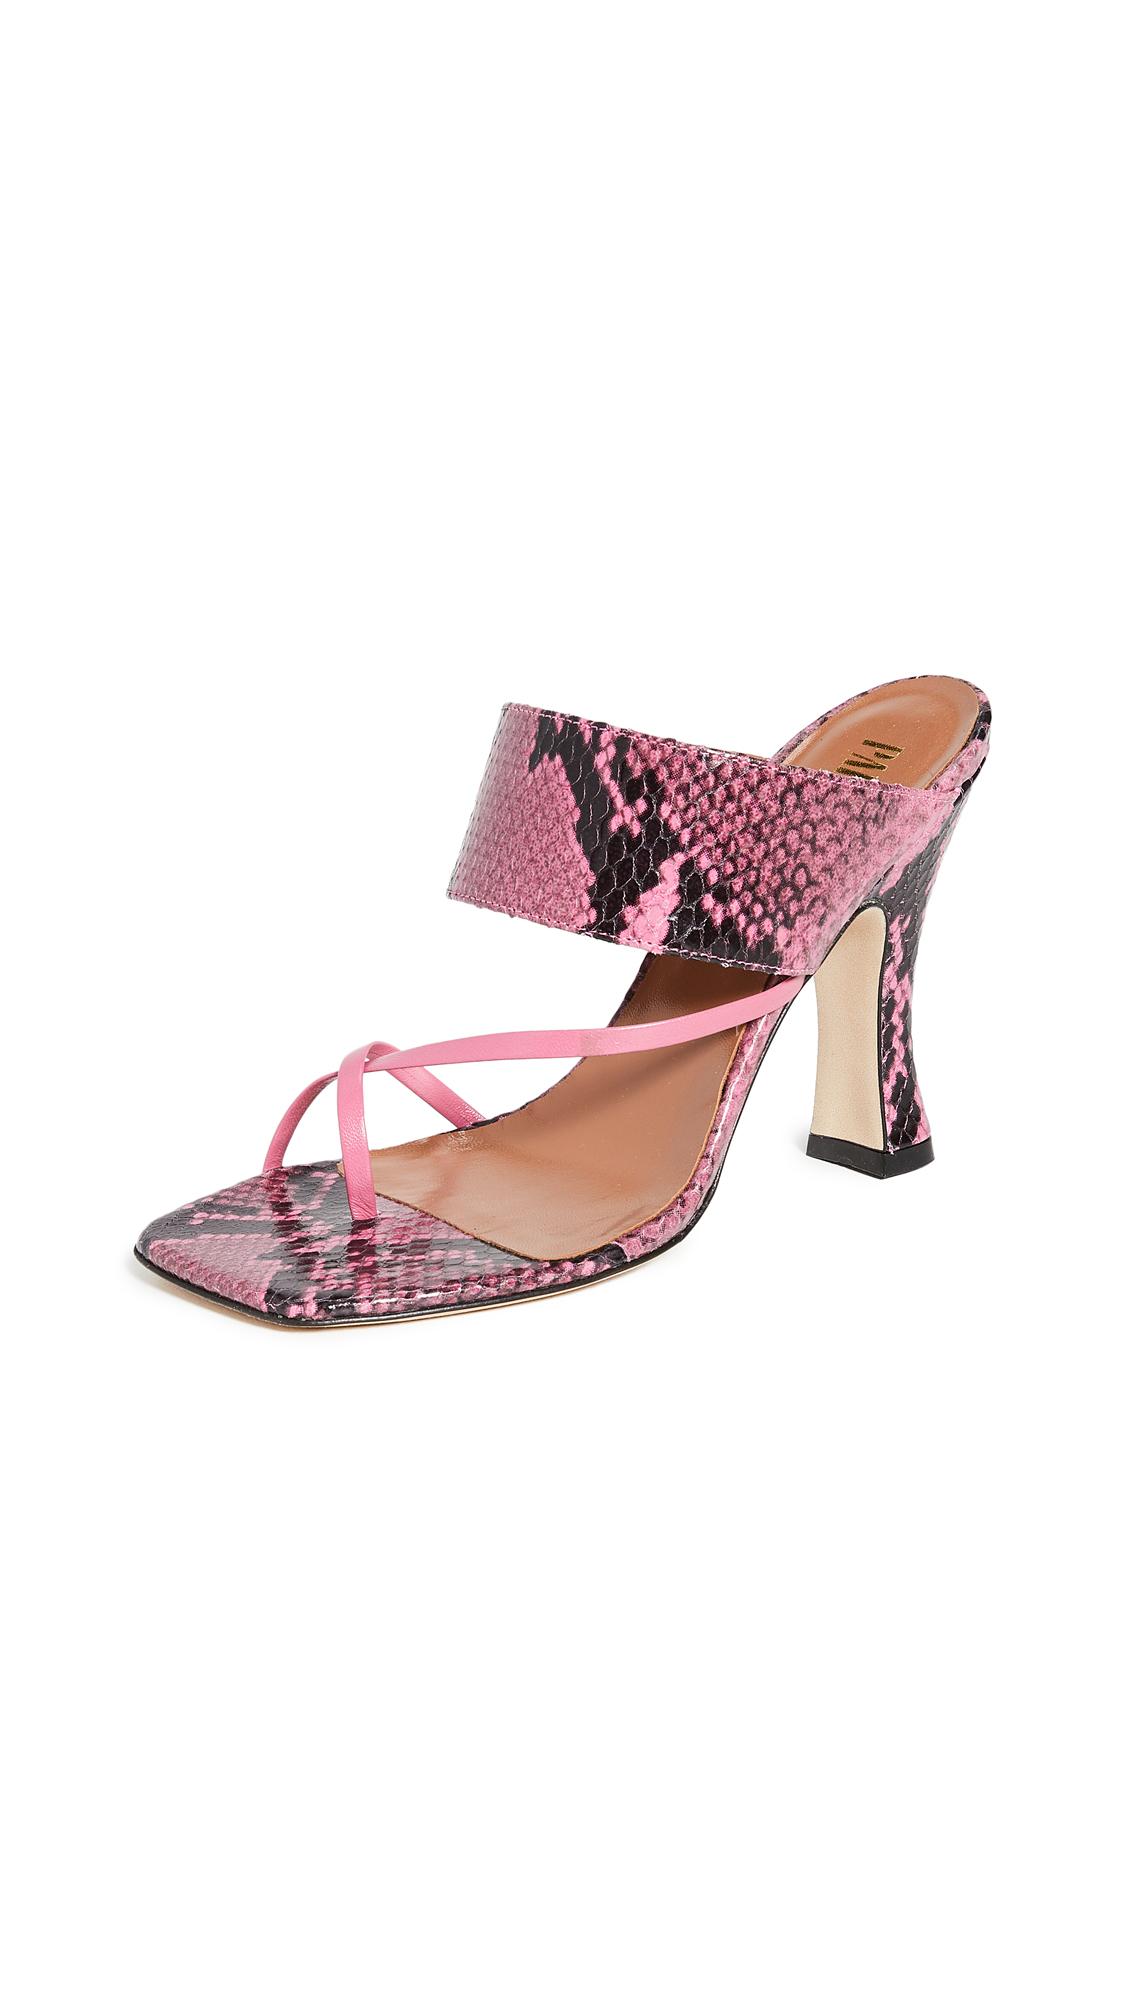 Buy Paris Texas Python Print Crossover Thong Sandals online, shop Paris Texas